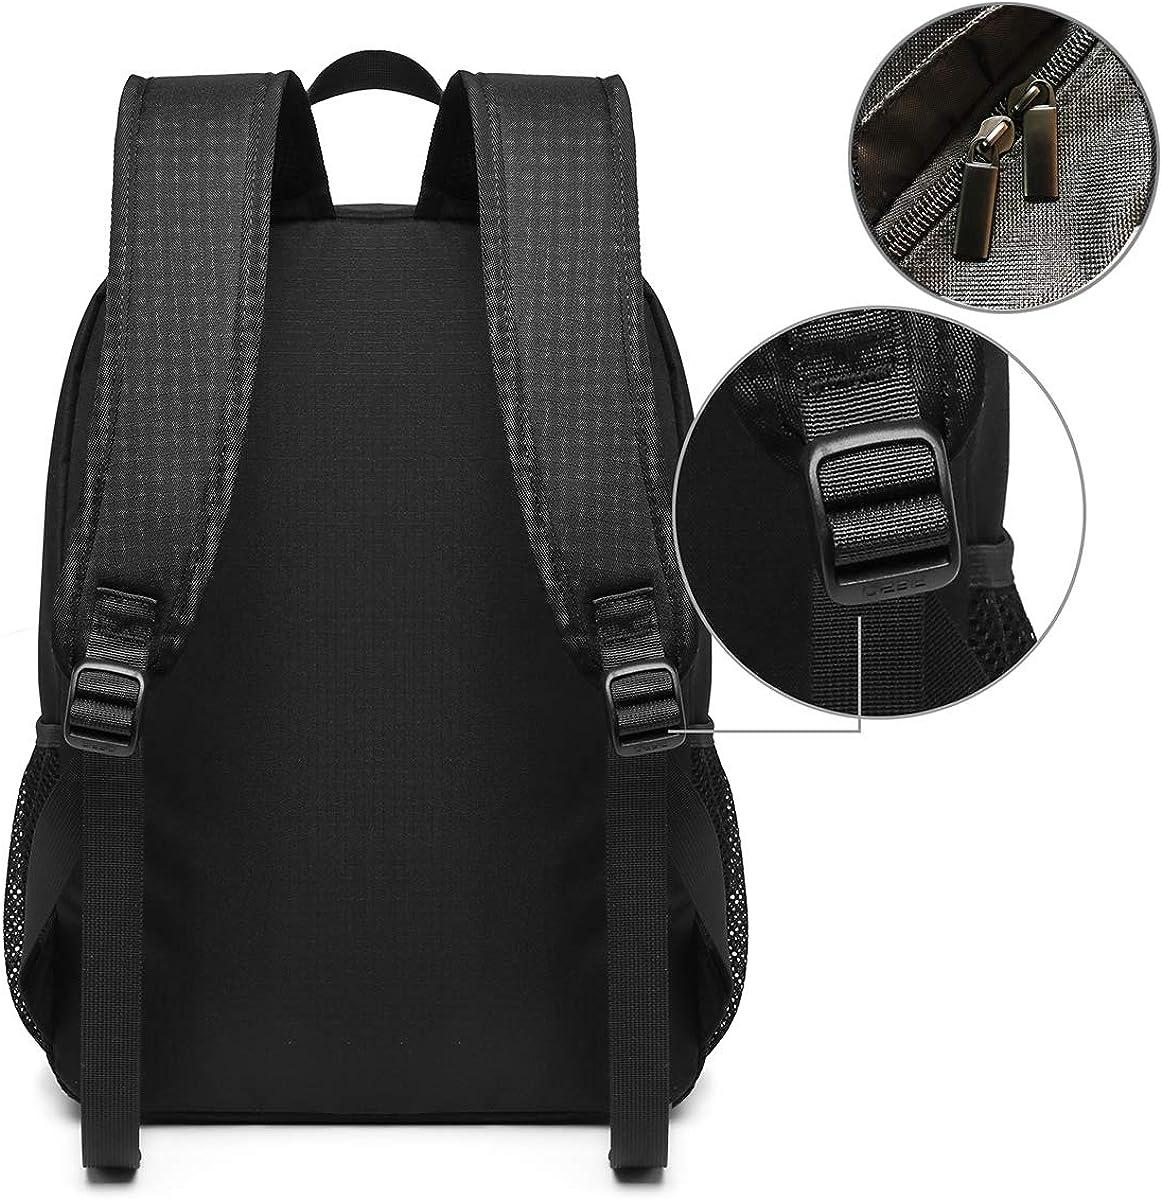 Anime Drago-n Ba-ll Z Goku School Backpack Lightweight Laptop Bag For Girls Boys